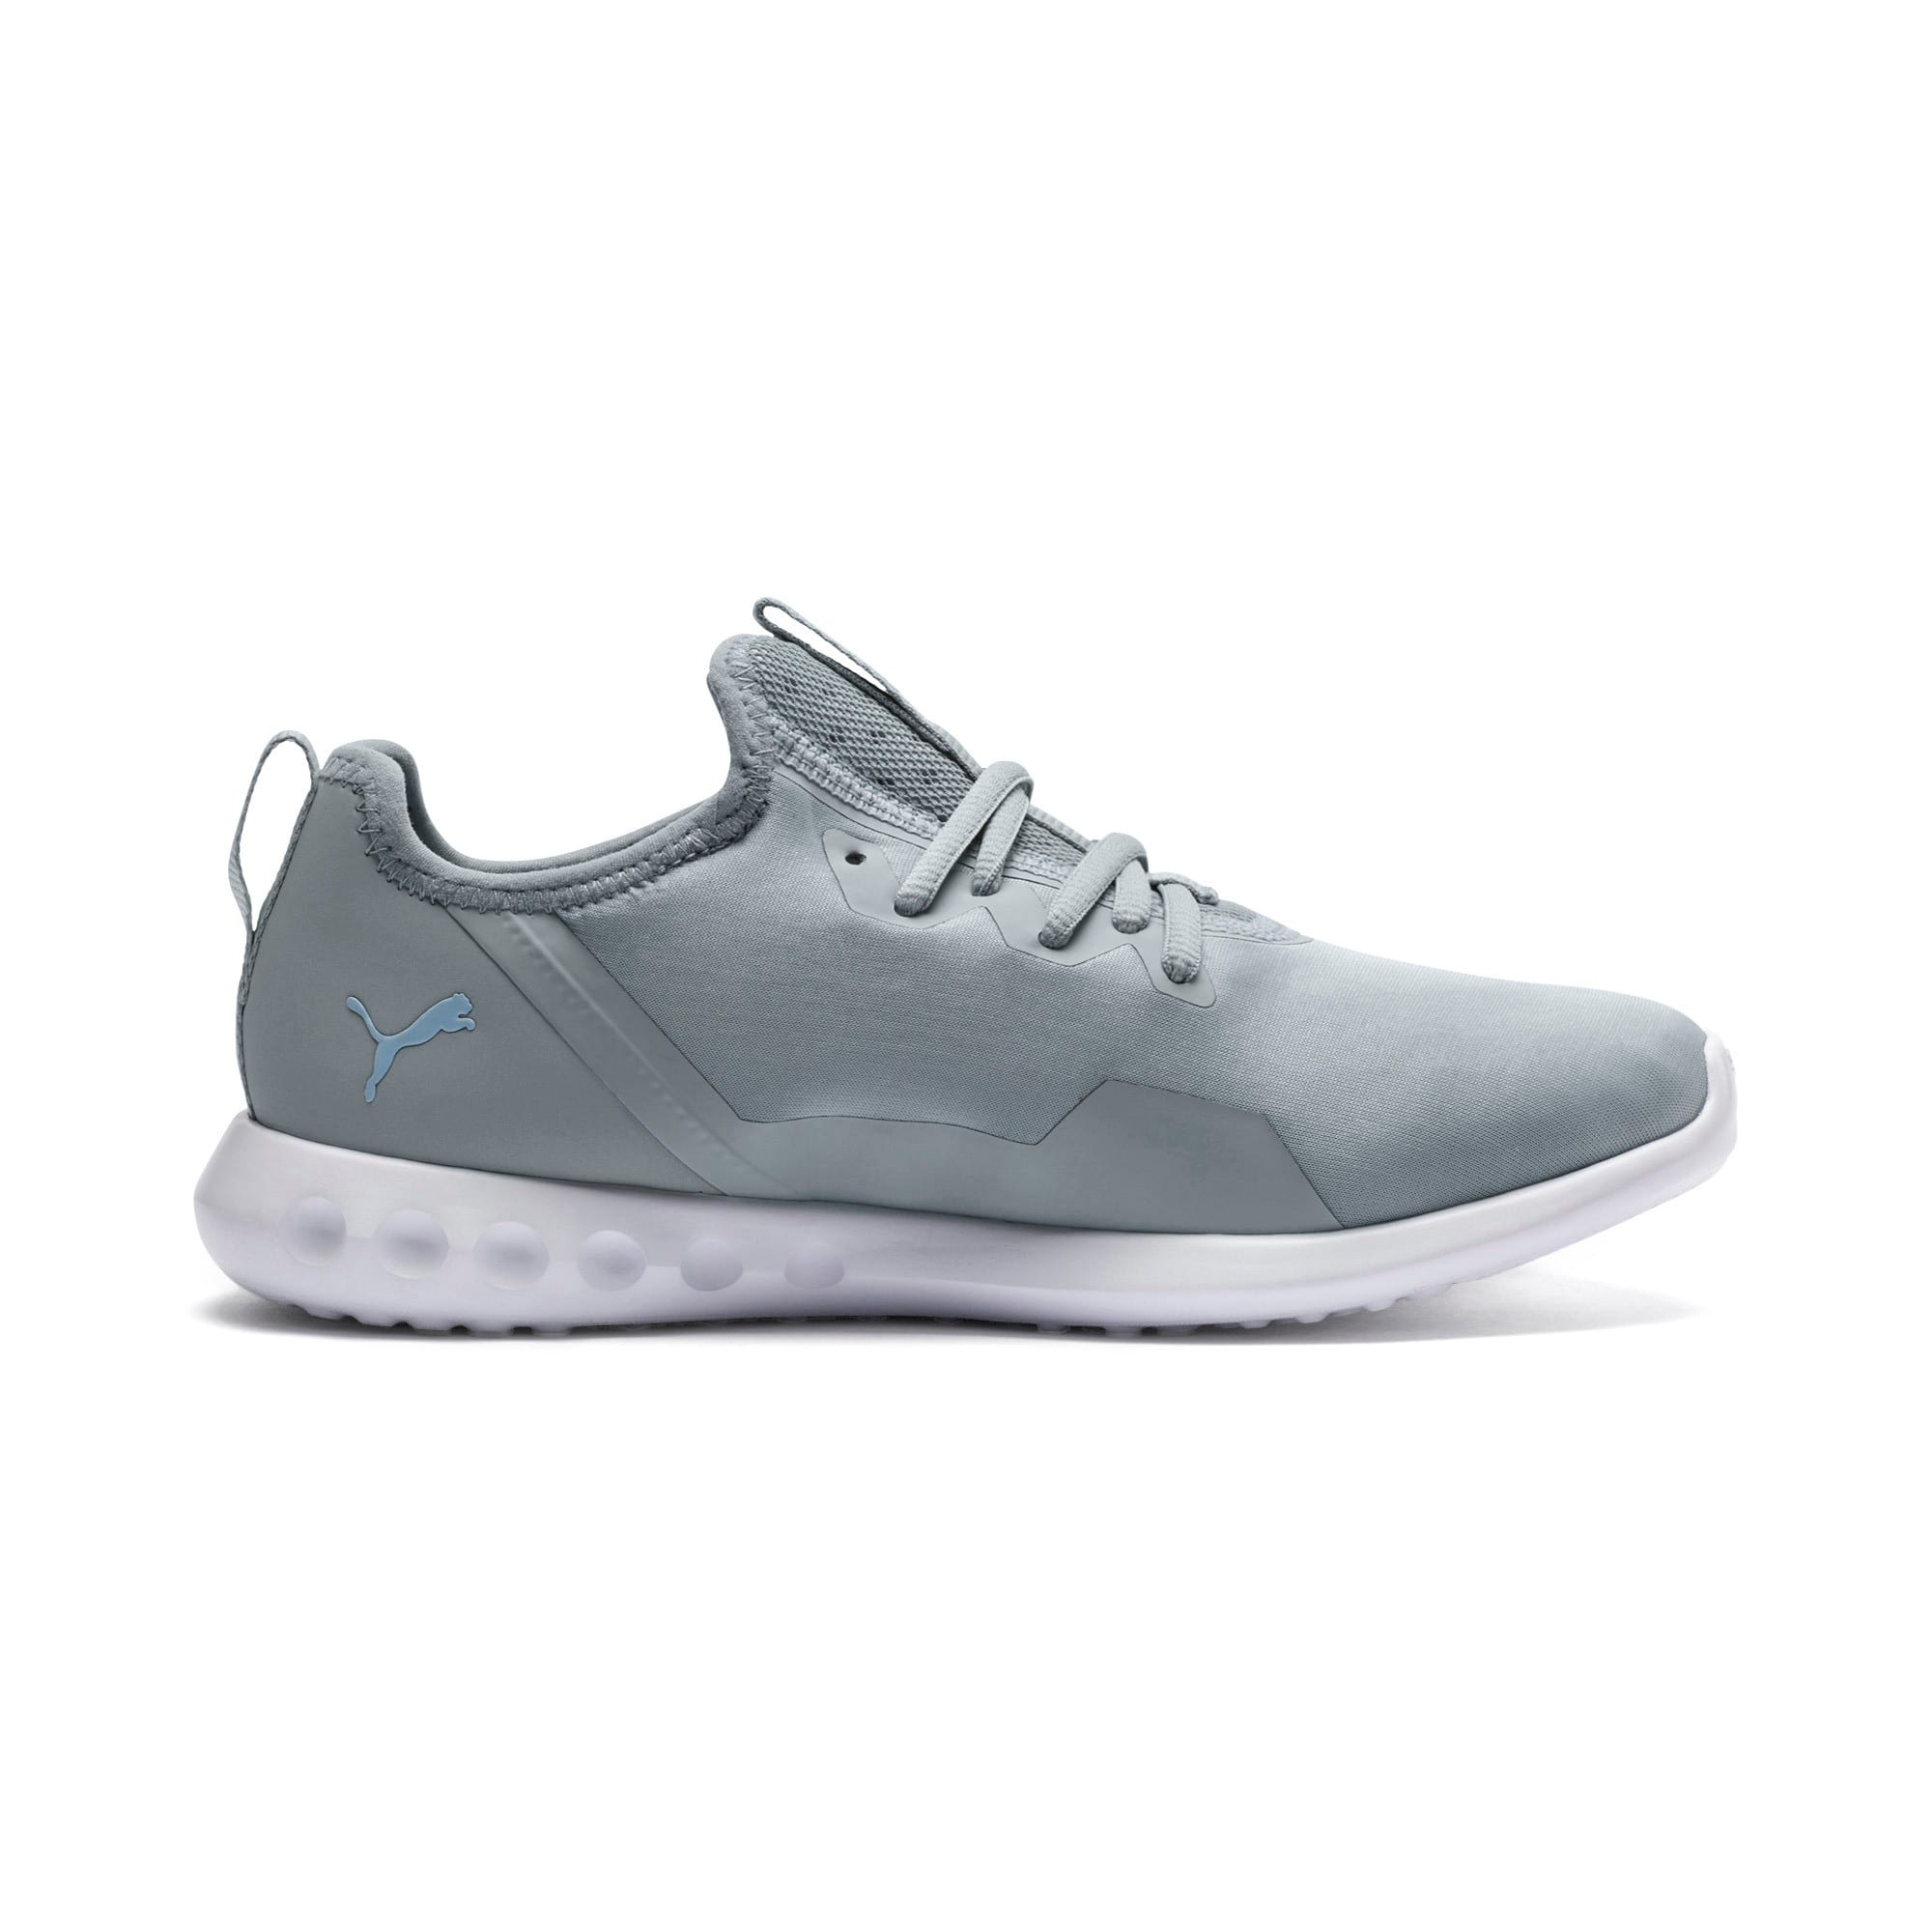 Thumbnail 5 of Carson 2 X Women's Running Shoes, Quarry-CERULEAN, medium